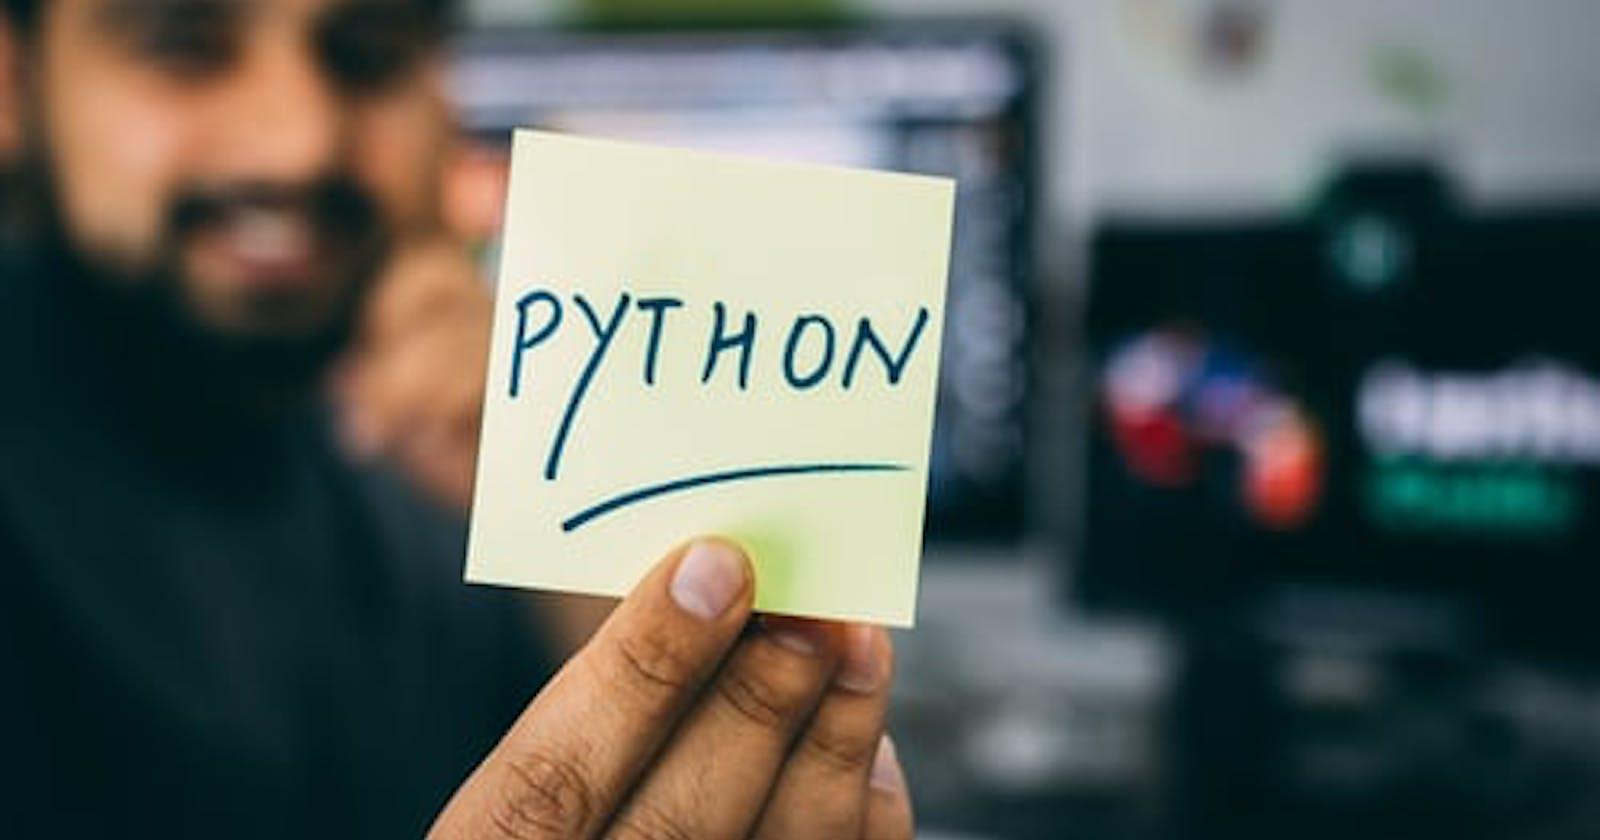 Beginner-friendly resources for Python